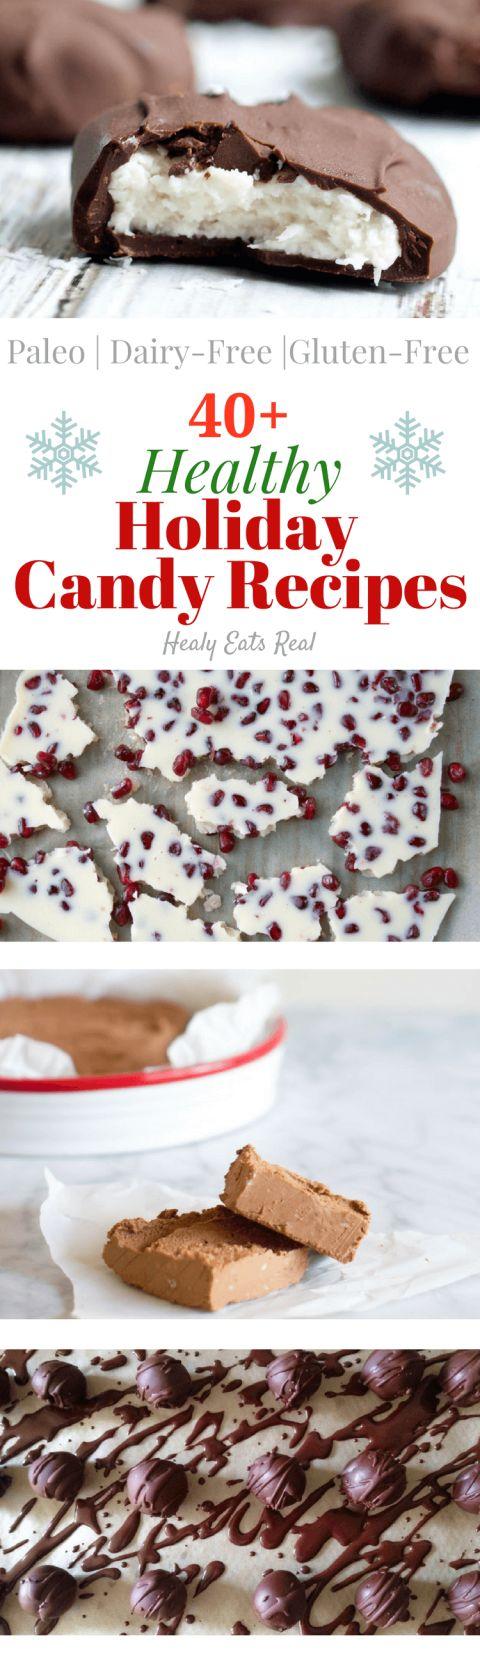 Healthy Holiday Candy Recipes (Paleo, Dairy Free)